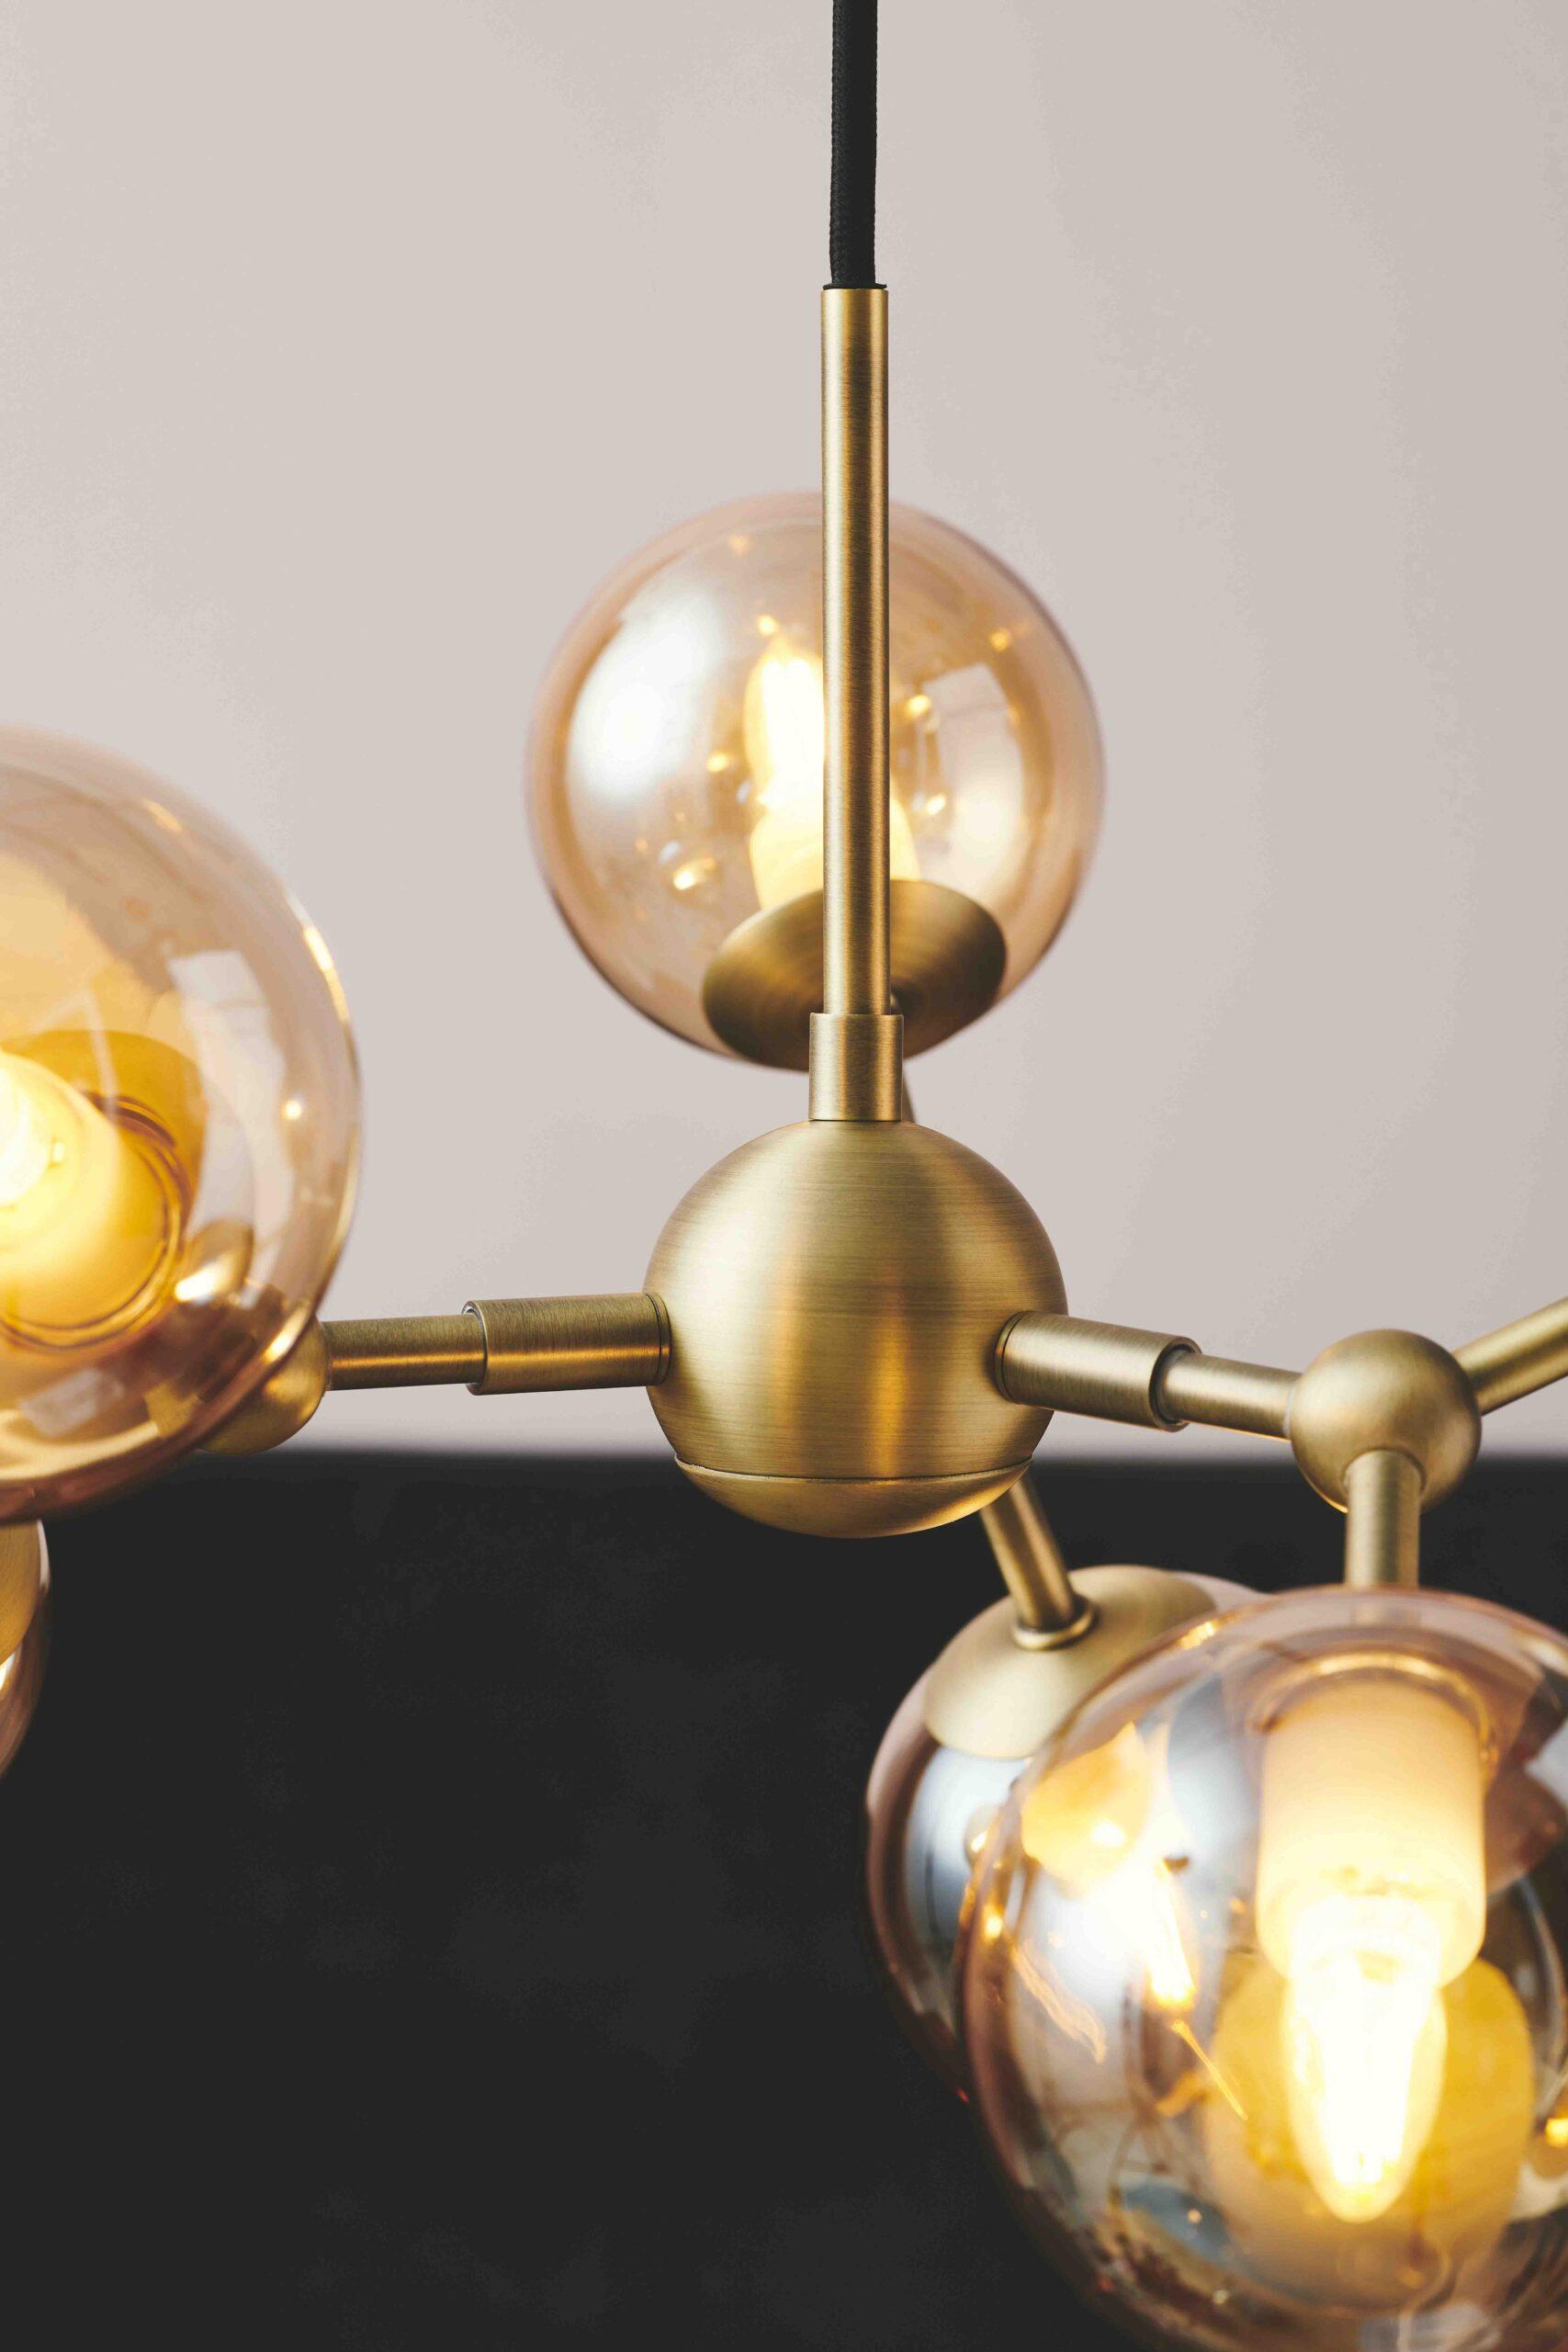 Halo Design Atom mini lysekrone antik messing